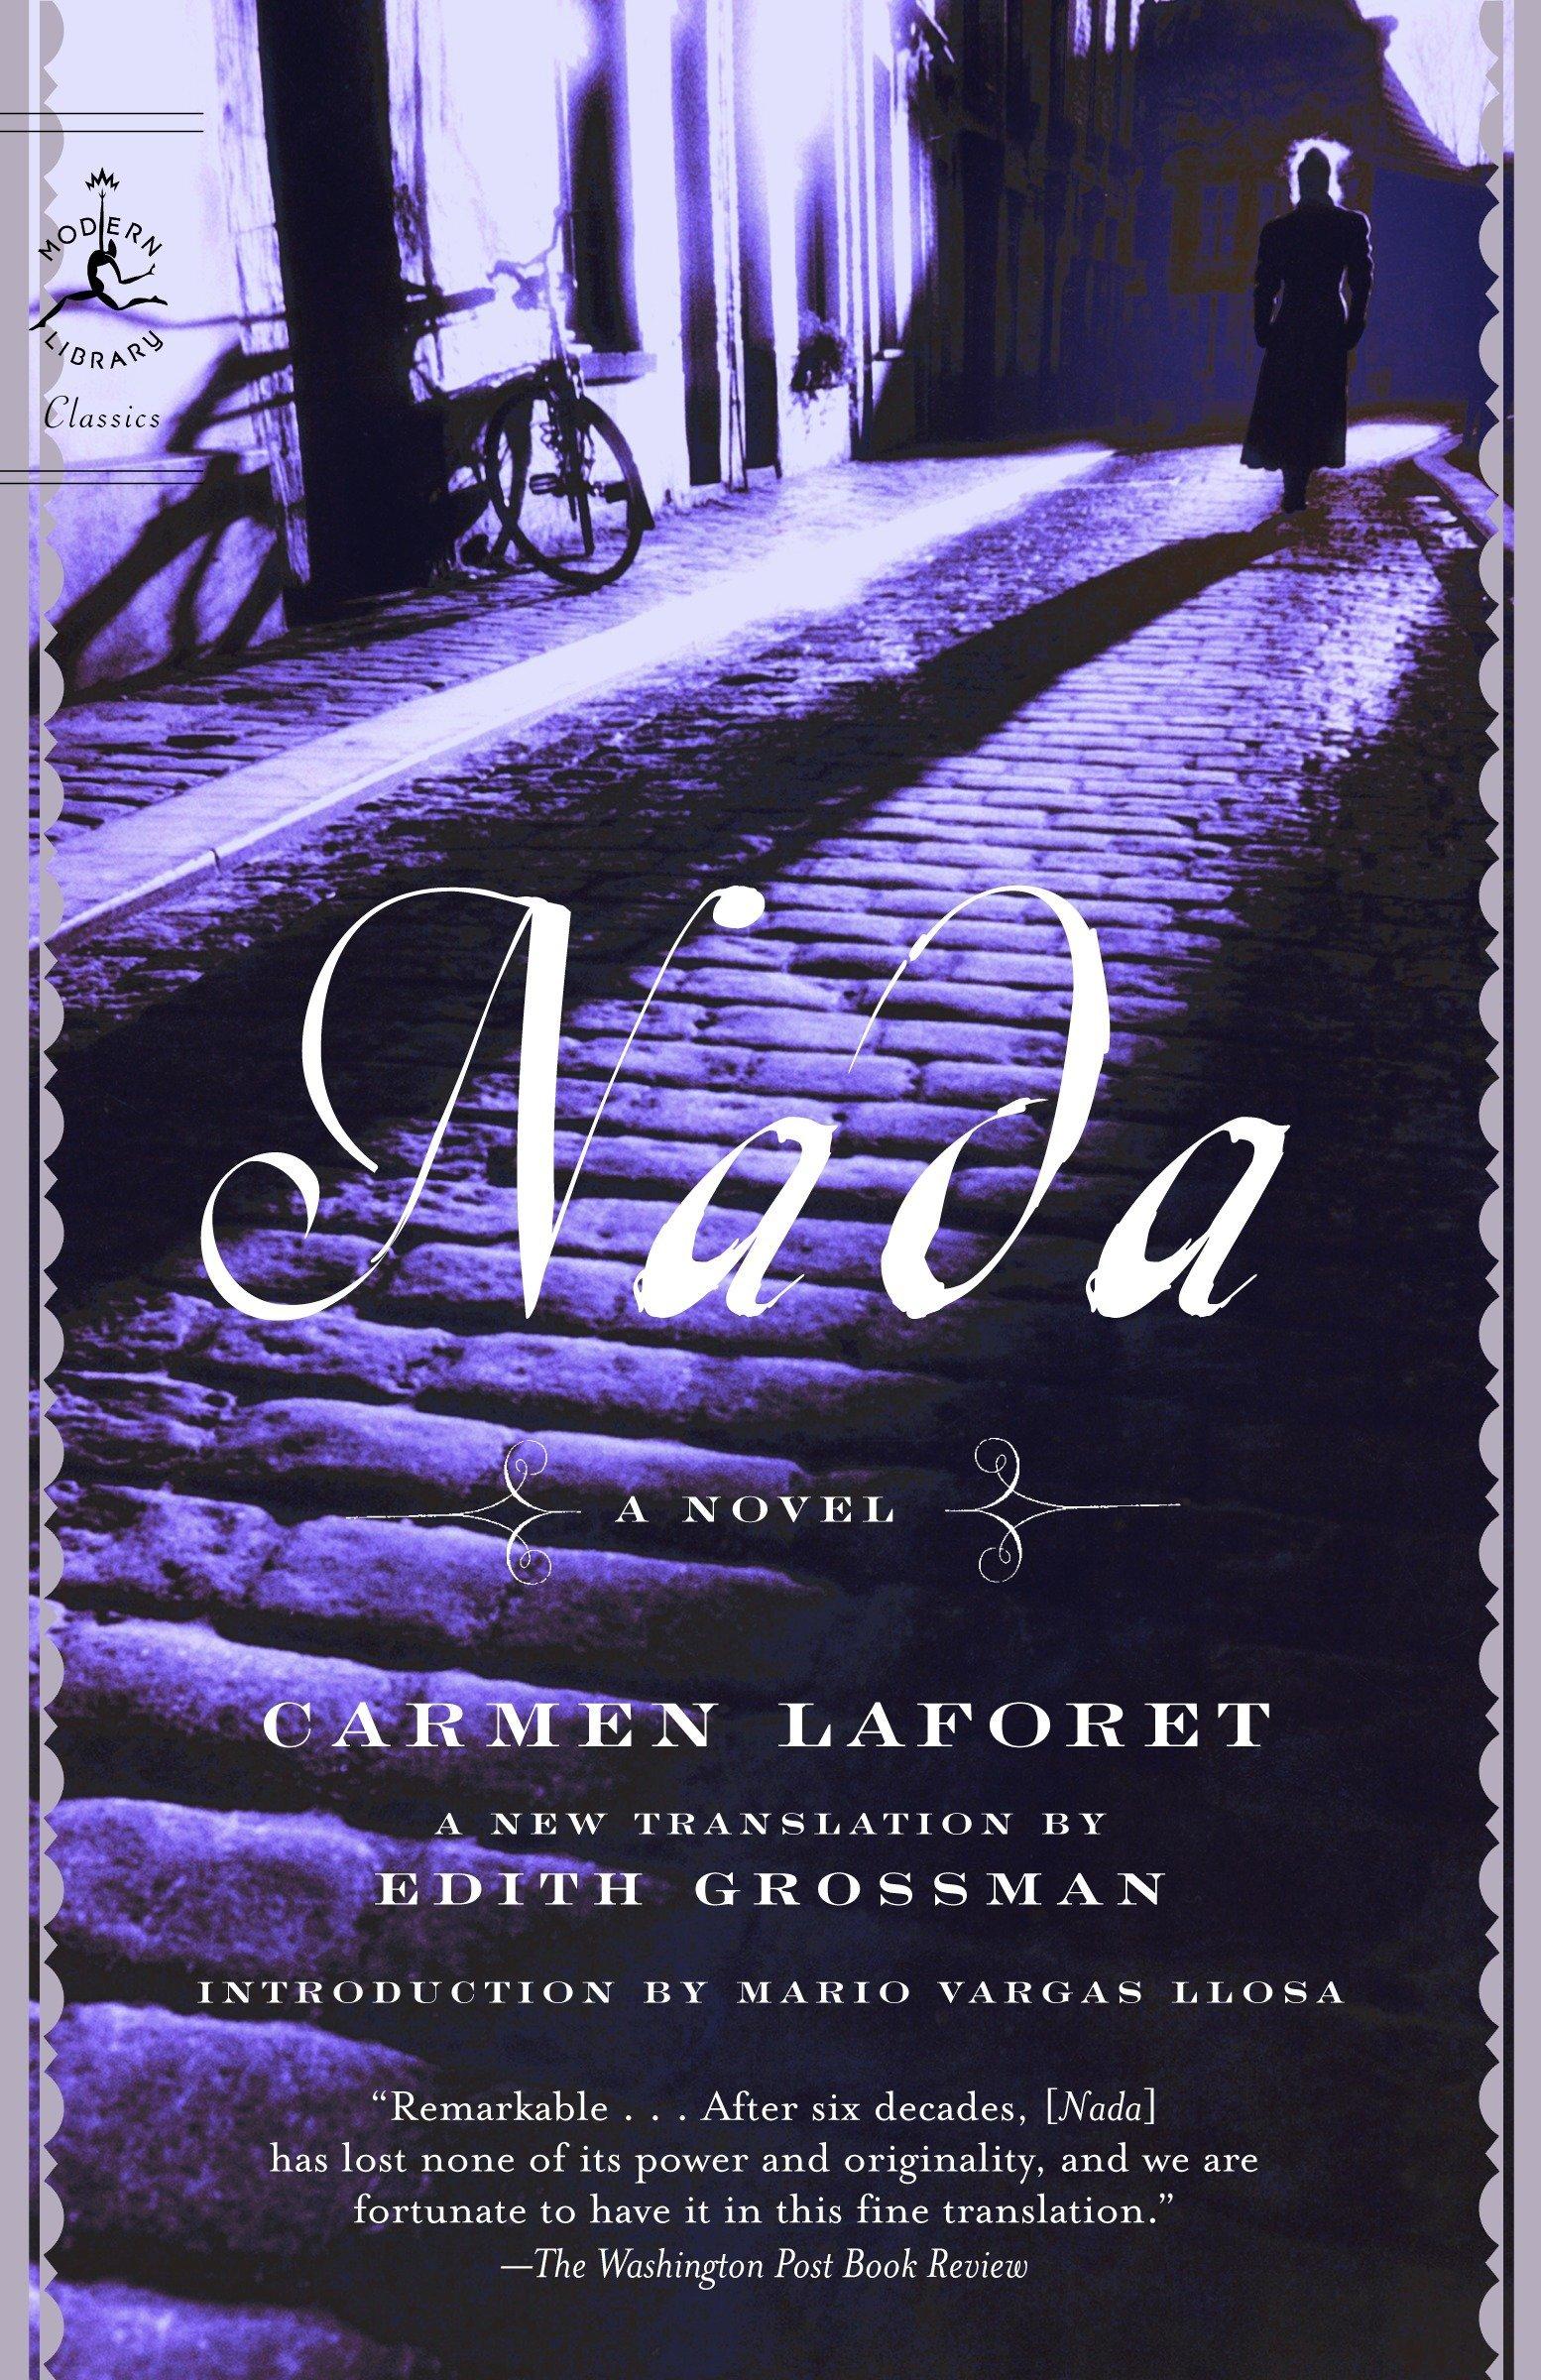 Amazon.com: Nada: A Novel (Modern Library Classics) (9780812975833 ...